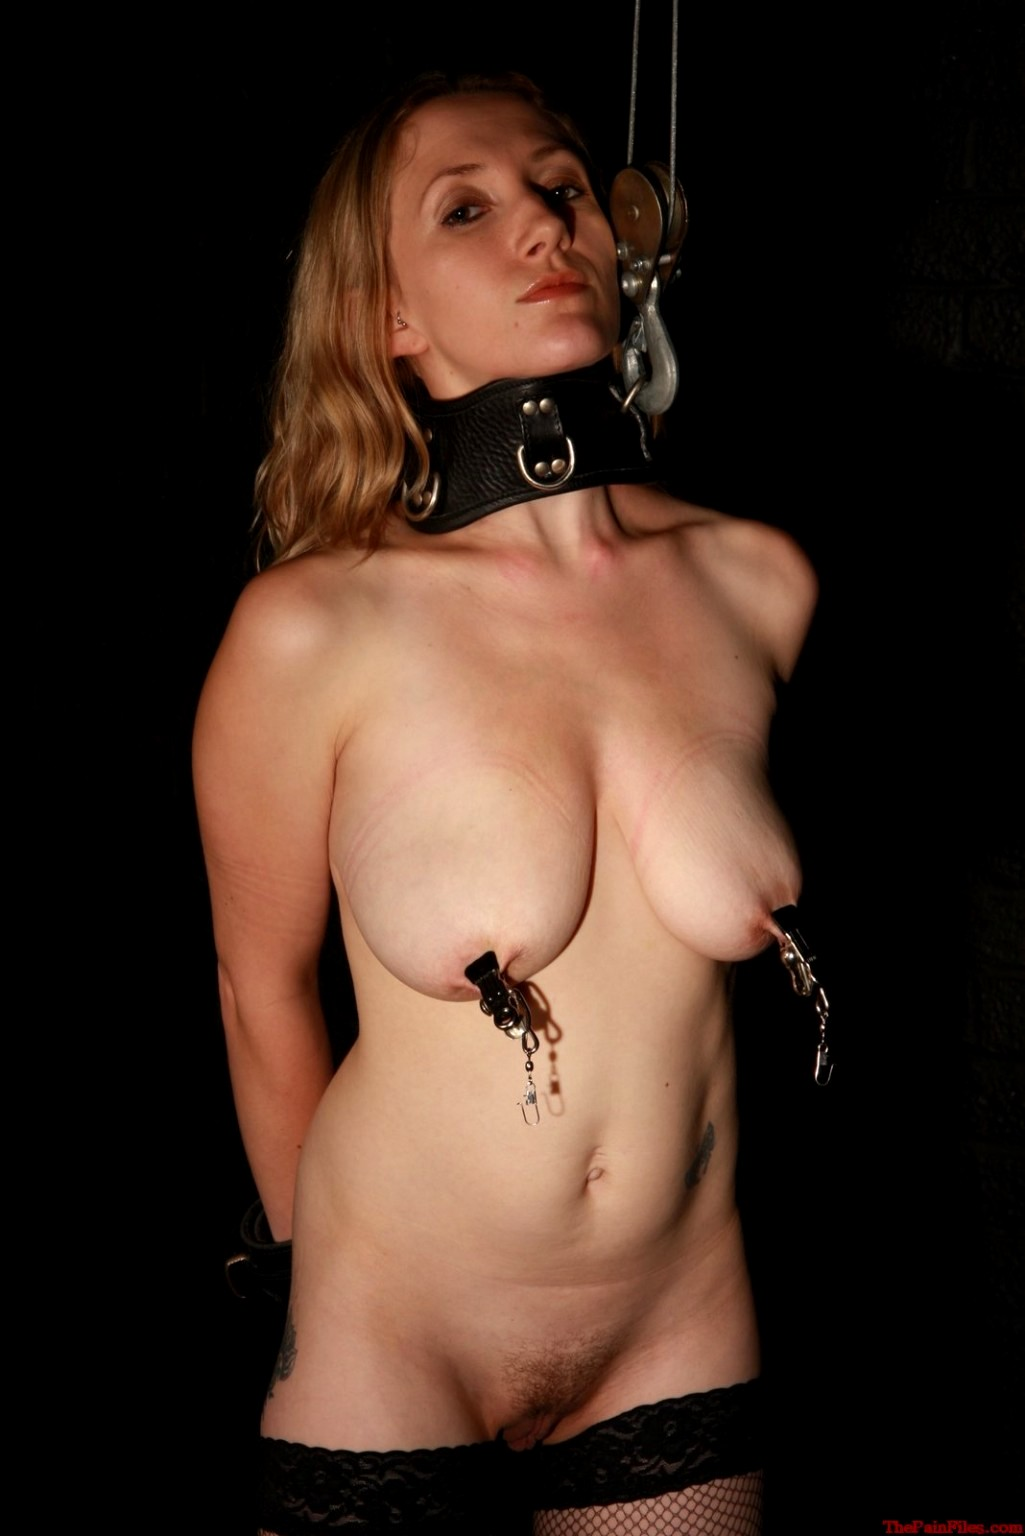 Gay pain bdsm leash collar slave